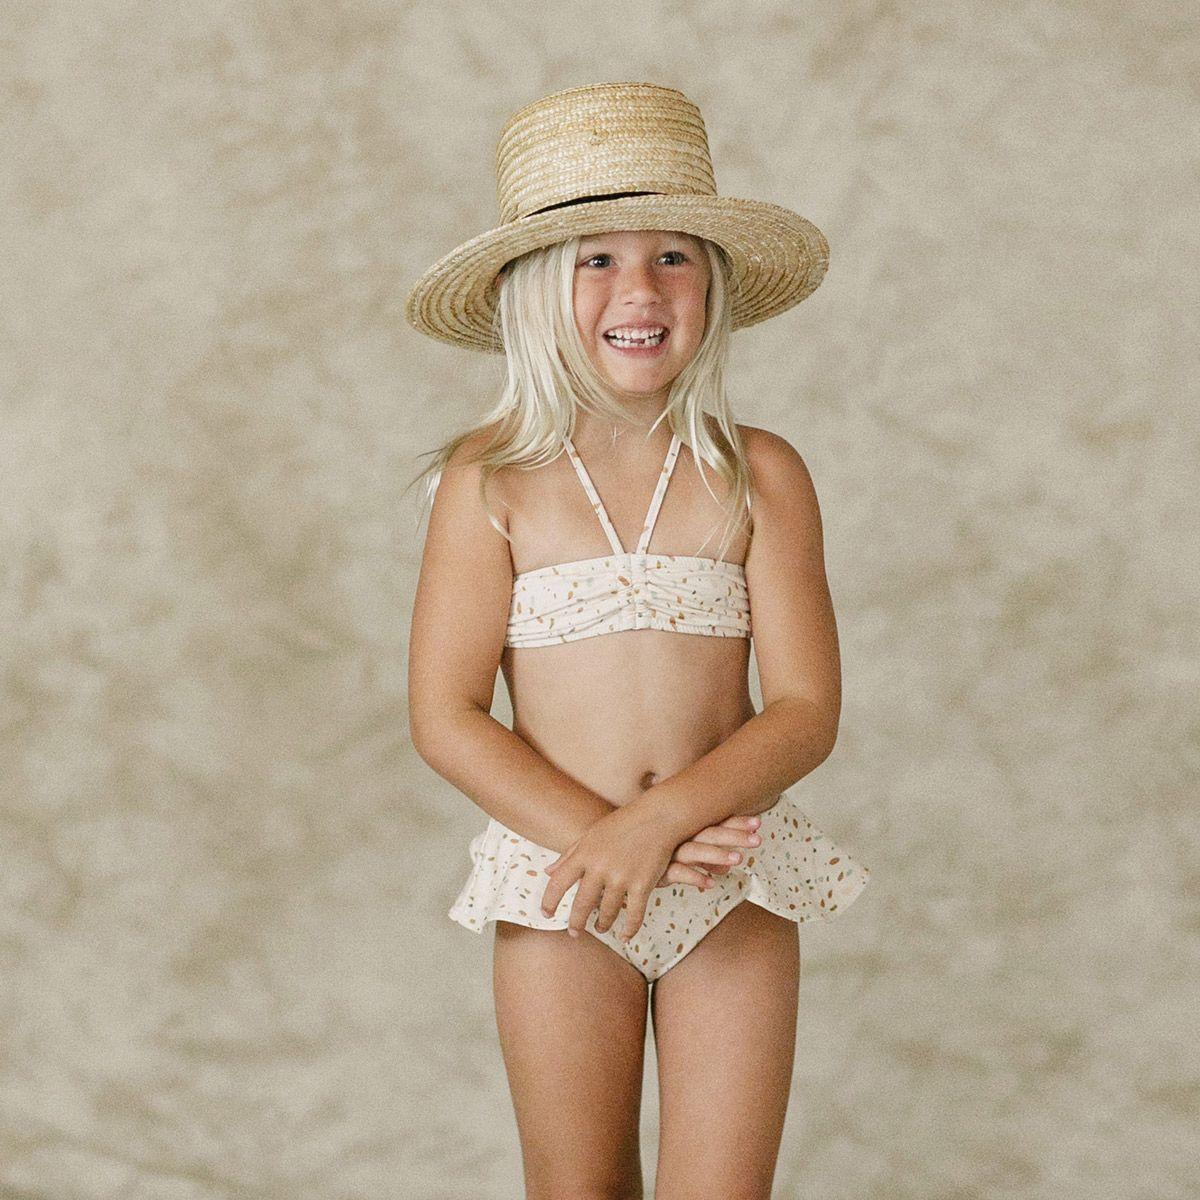 Fresh Arrival Rylee Cru Ss17 Swimwear Child Girl Fashion Cool Outfits Fashion